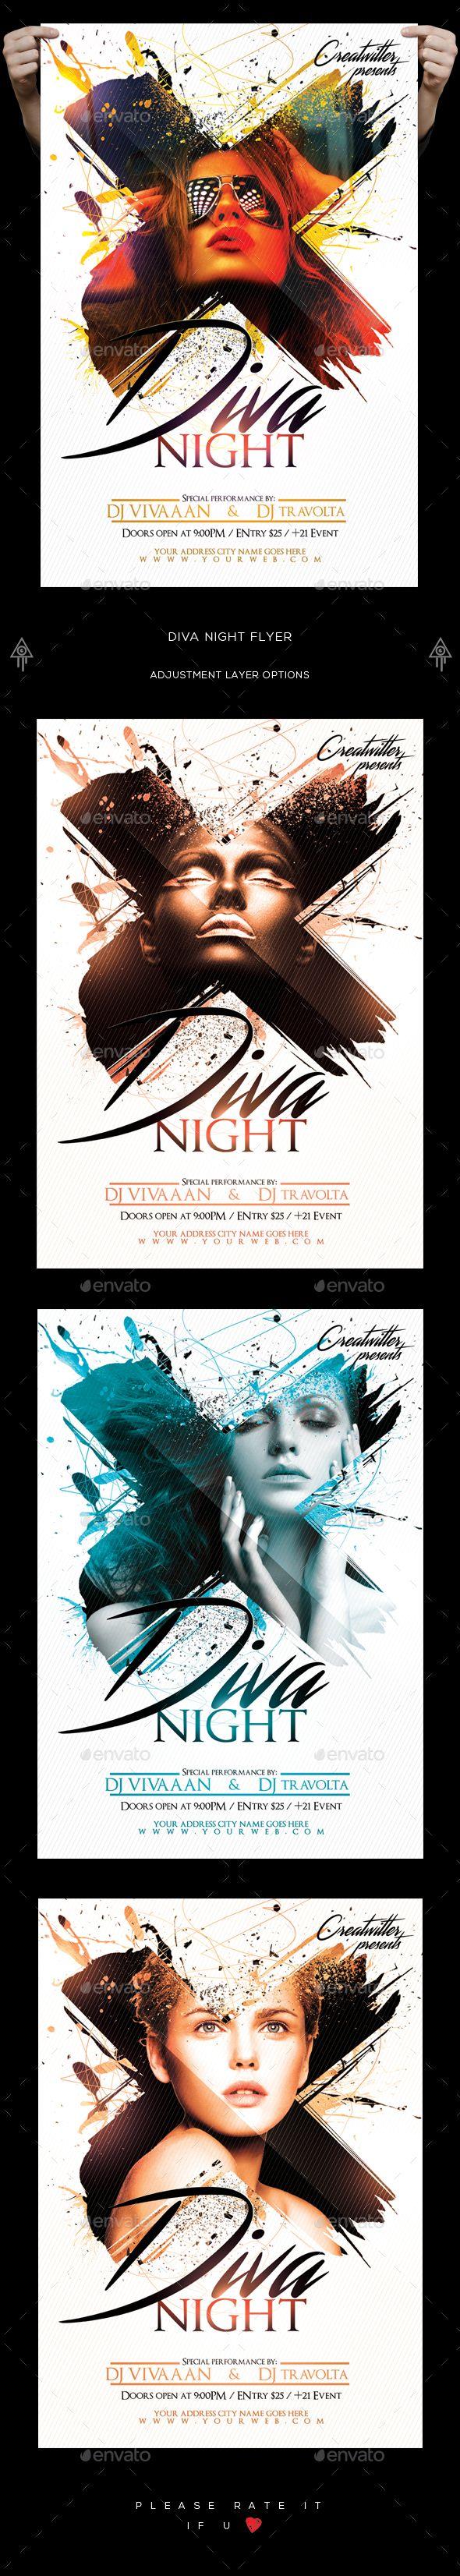 Diva Night Flyer  — PSD Template #vip #ladies night • Download ➝ https://graphicriver.net/item/diva-night-flyer/18329355?ref=pxcr